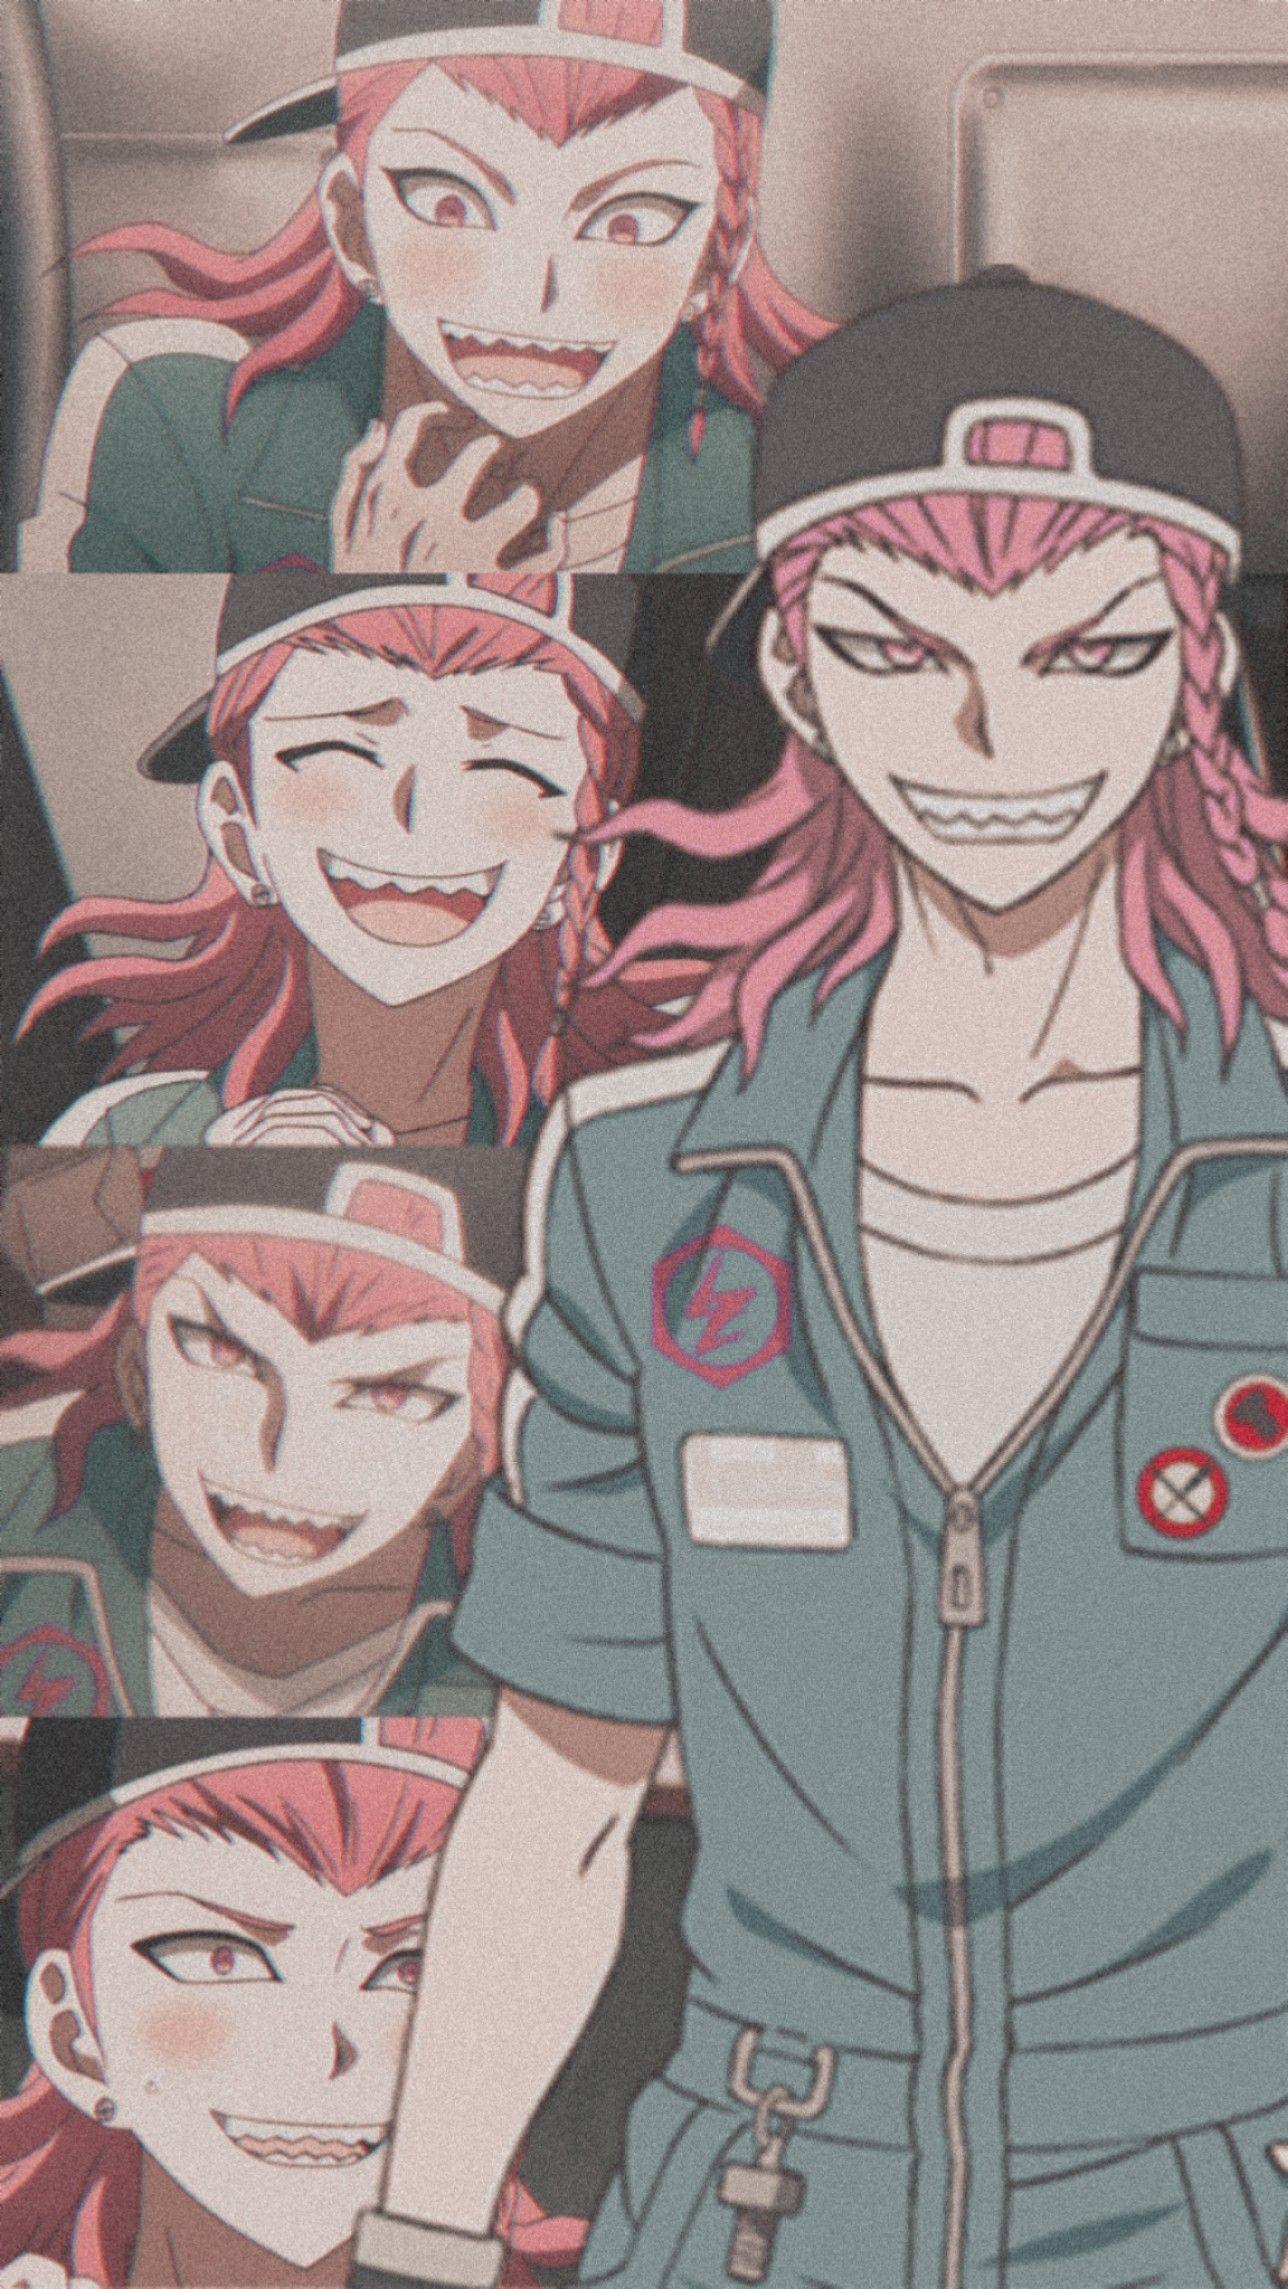 Kazuichi Souda Soda Anime Wallpaper Aesthetic Anime Anime Baby